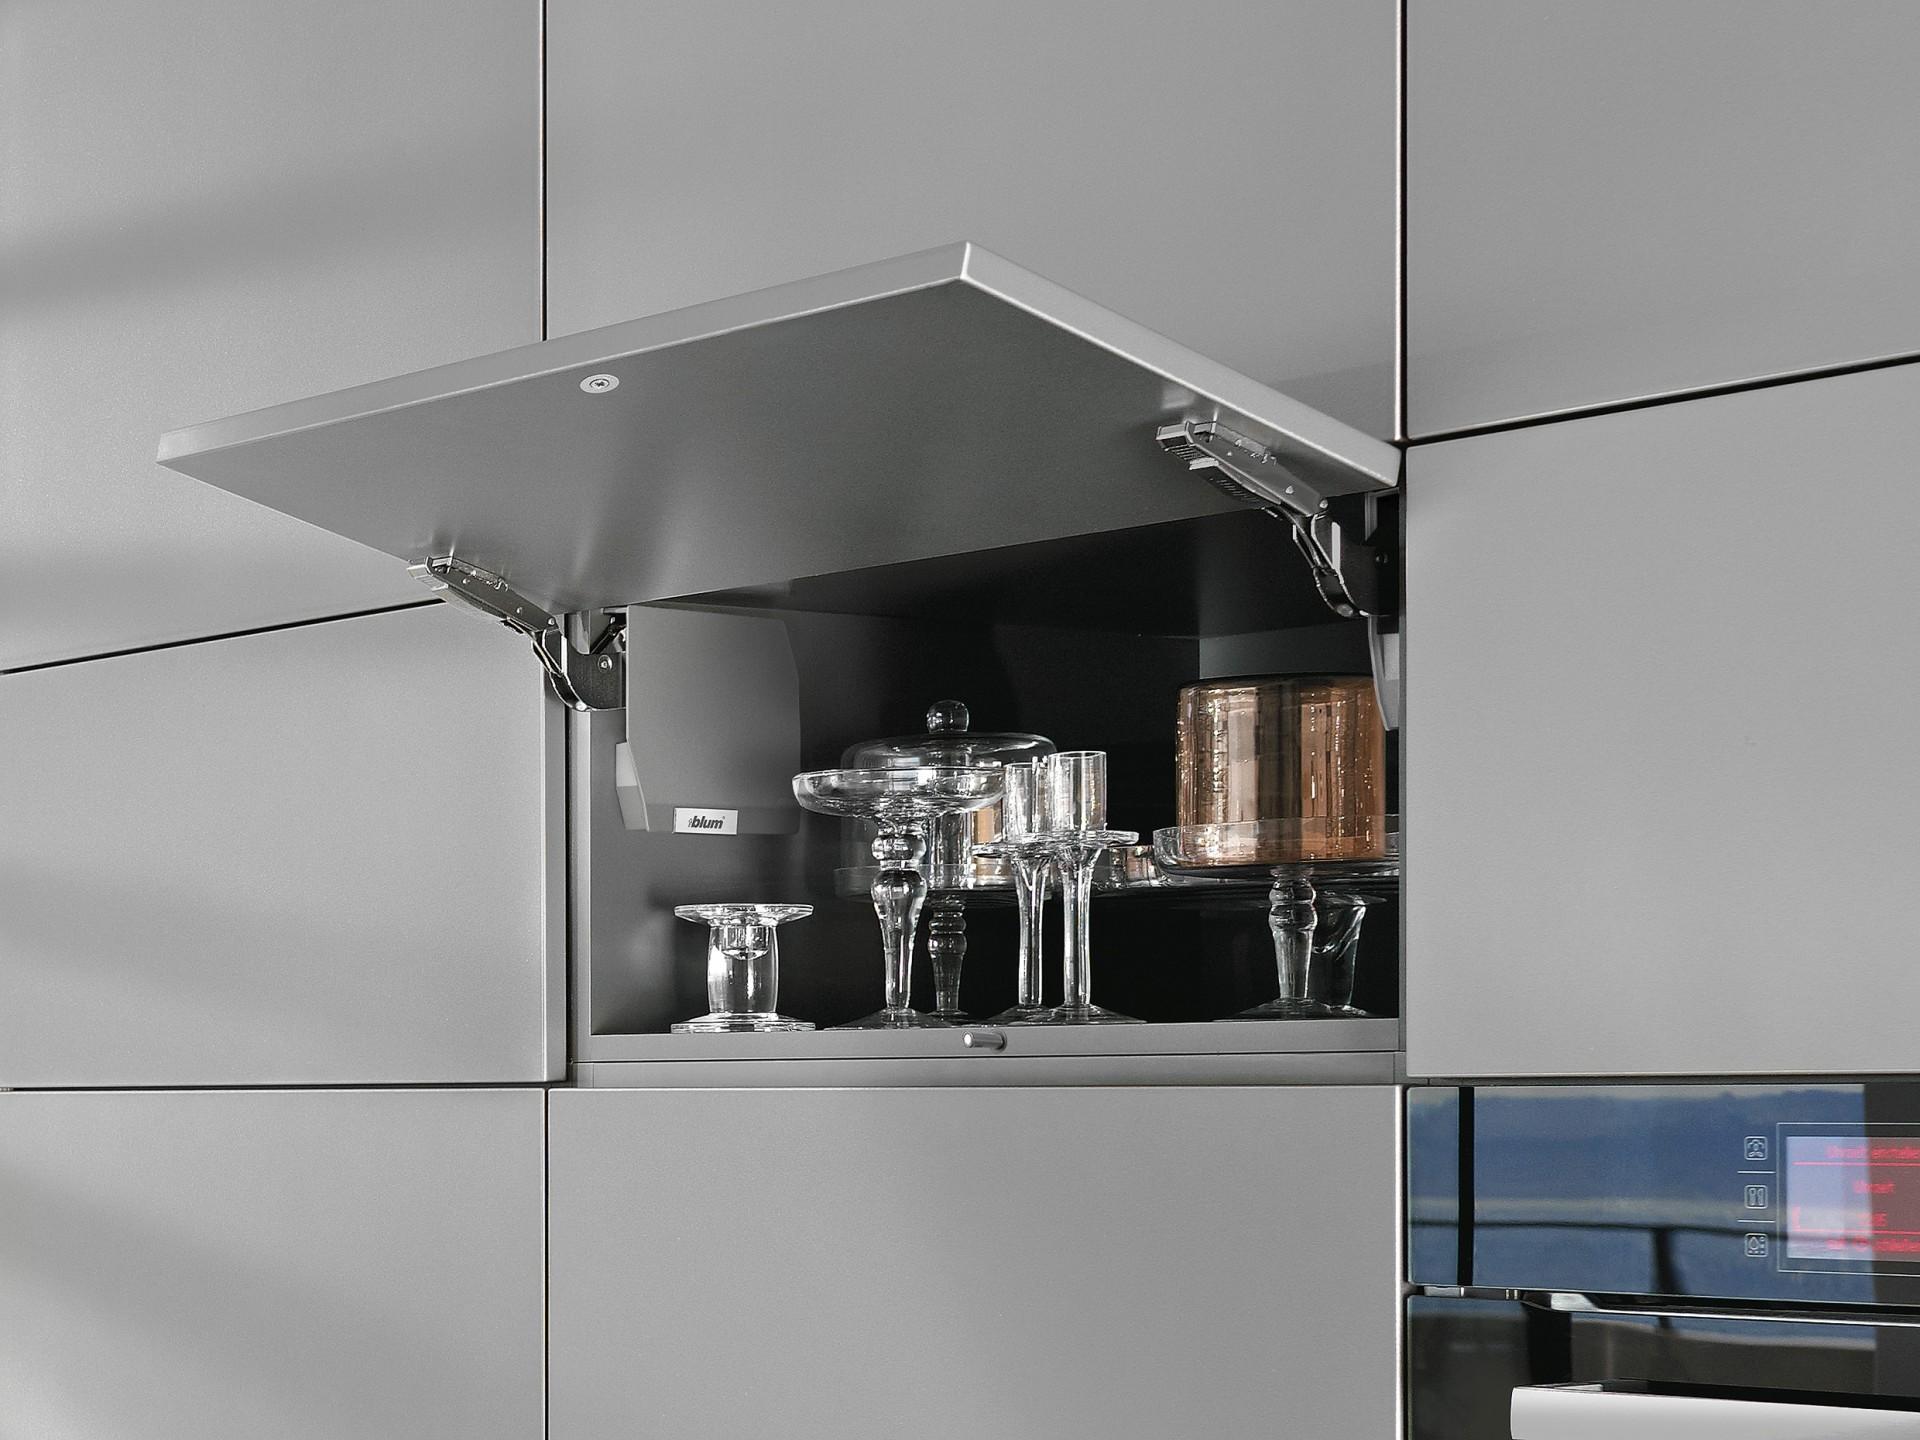 Aventos Lift Systems Overview Blum